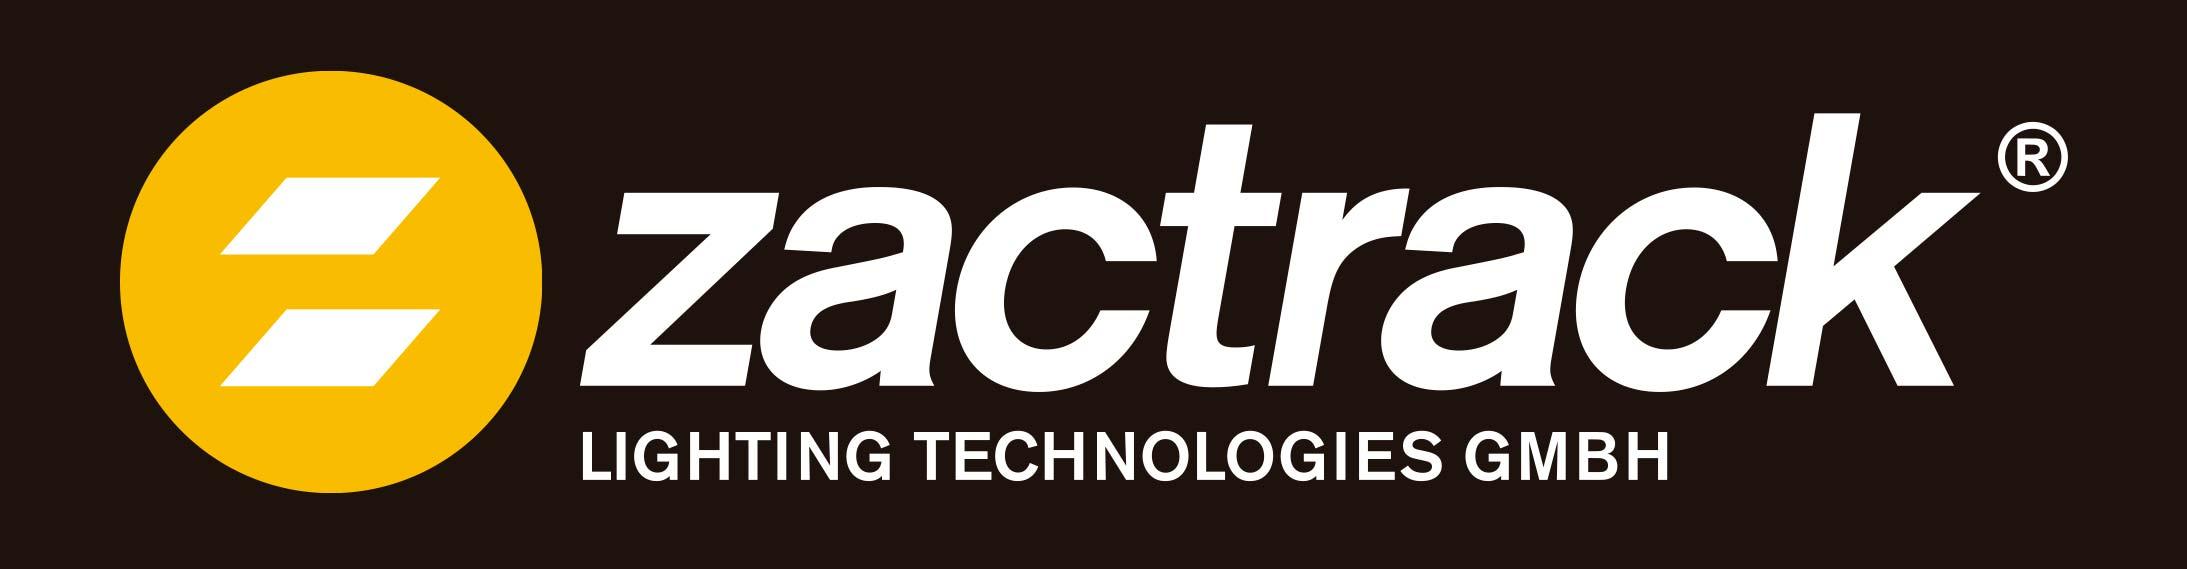 zactrack-Logoblatt-2014